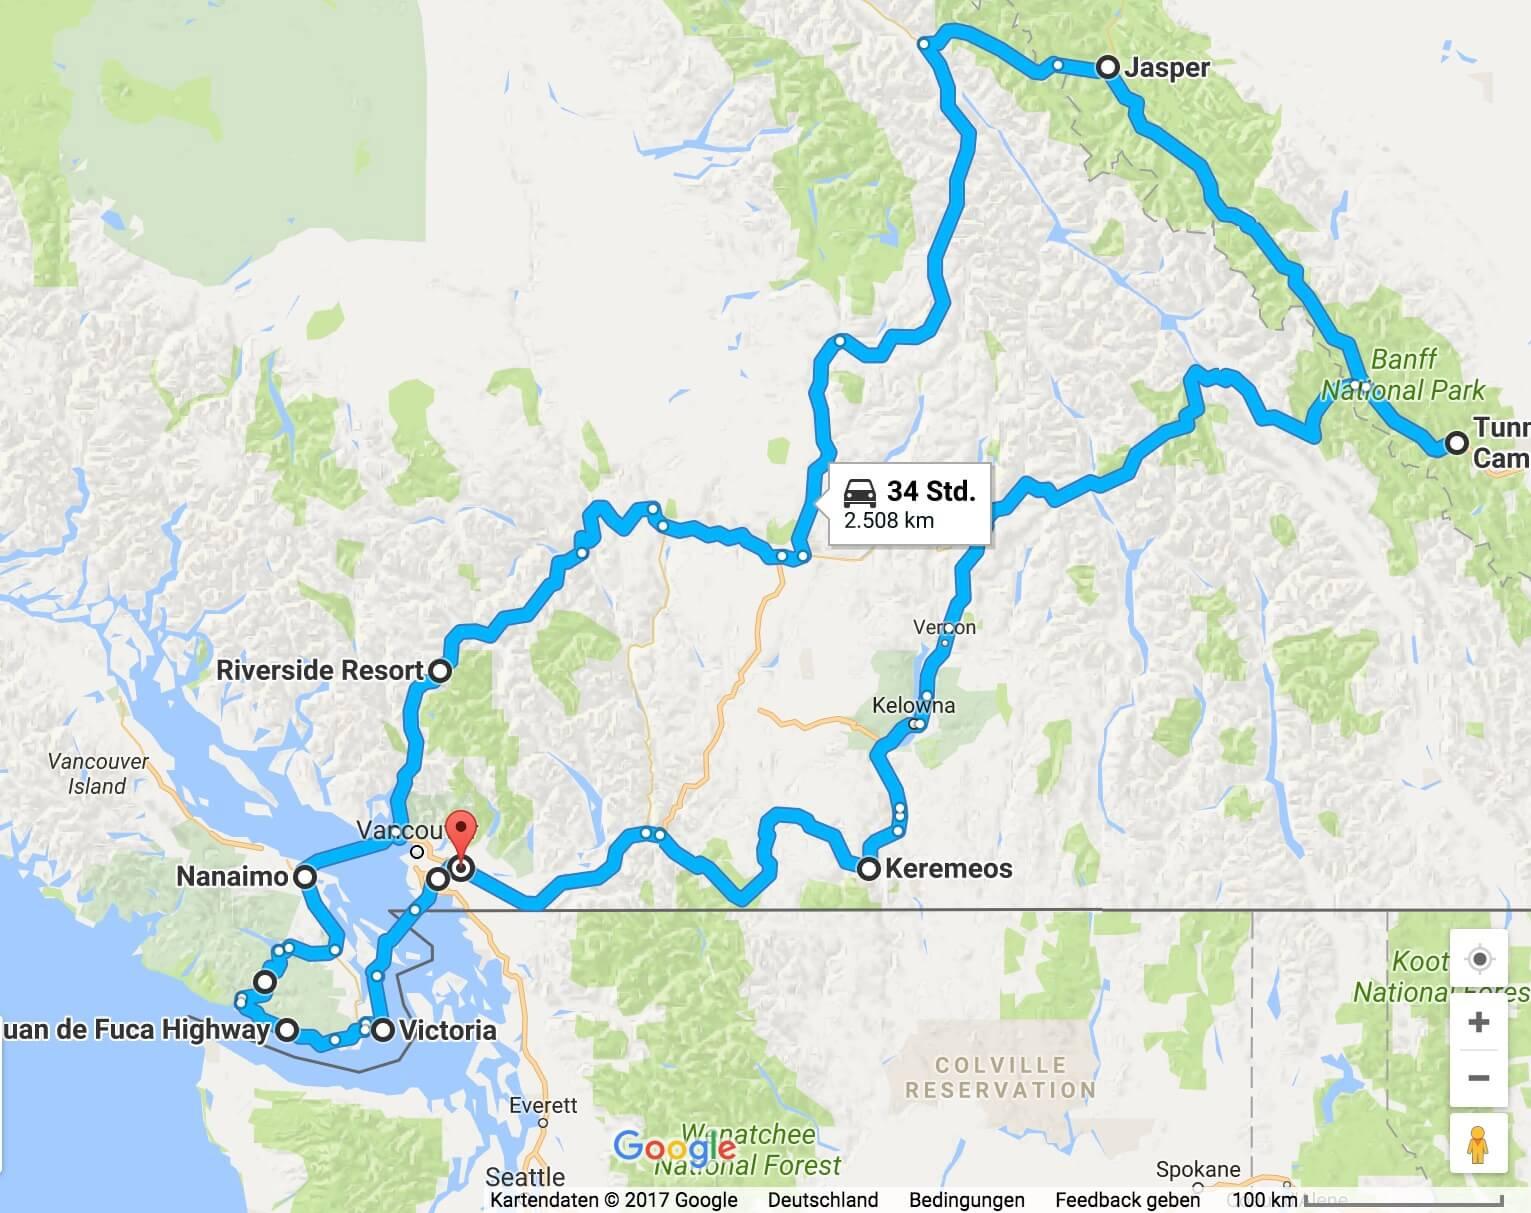 Die Route des Familienurlaub Kanada 2016